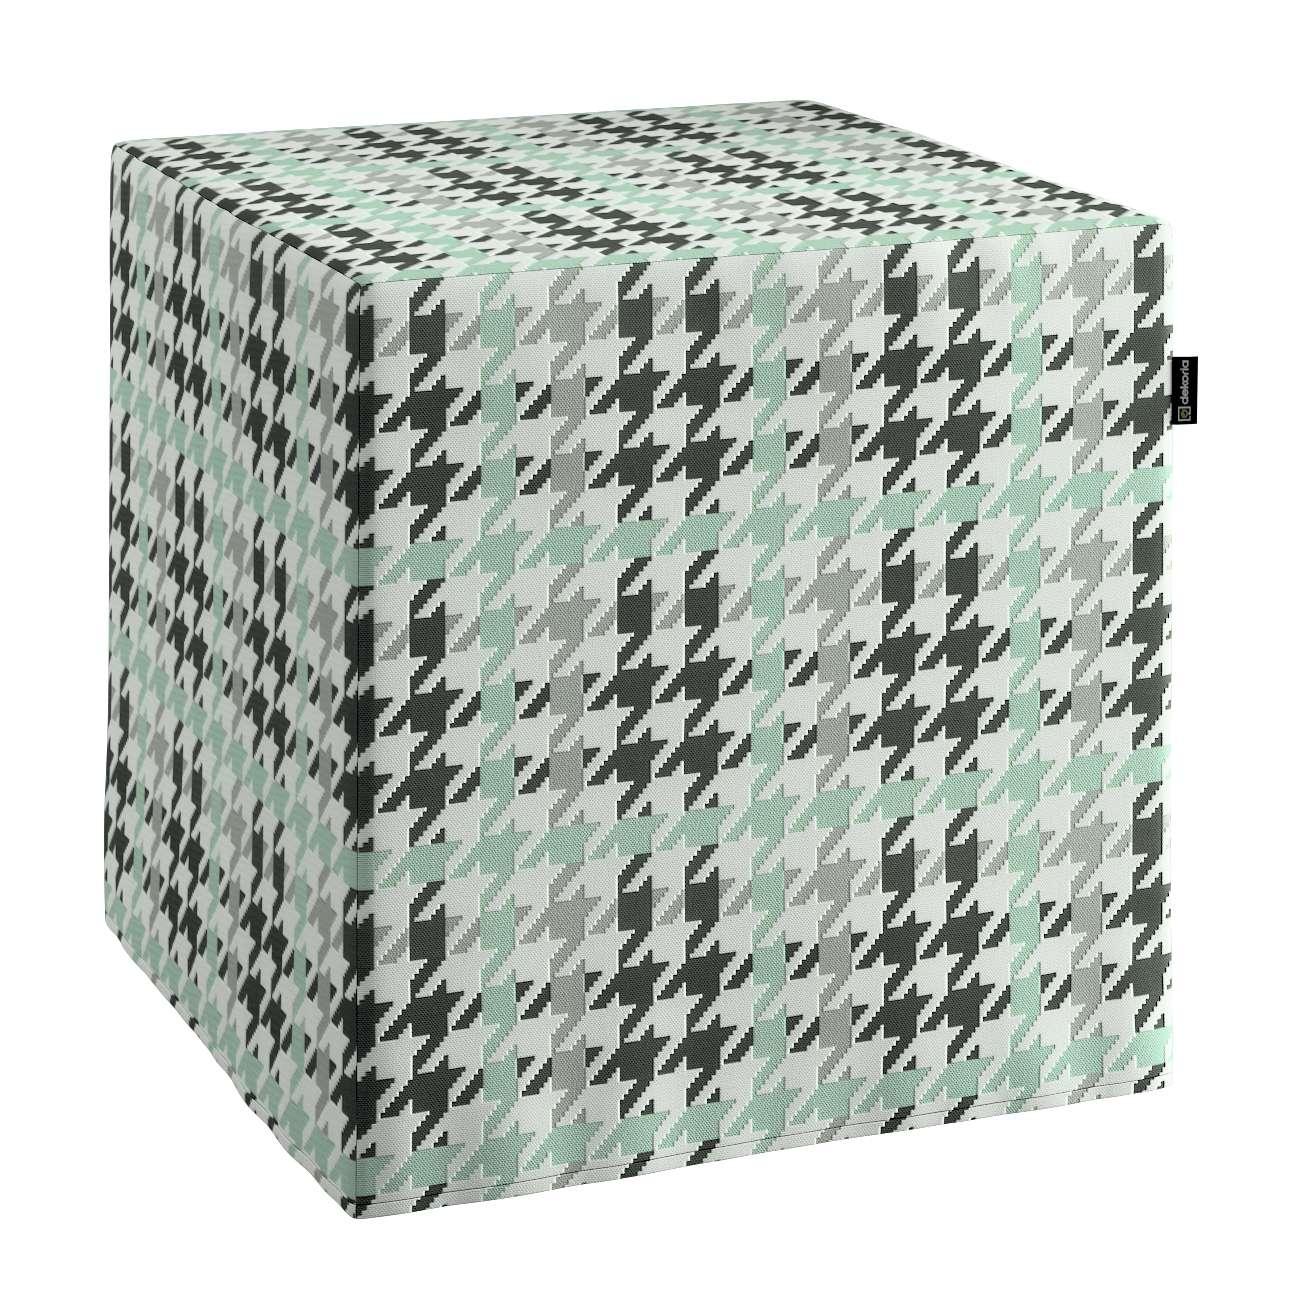 Taburetka tvrdá, kocka V kolekcii Výpredaj, tkanina: 137-77